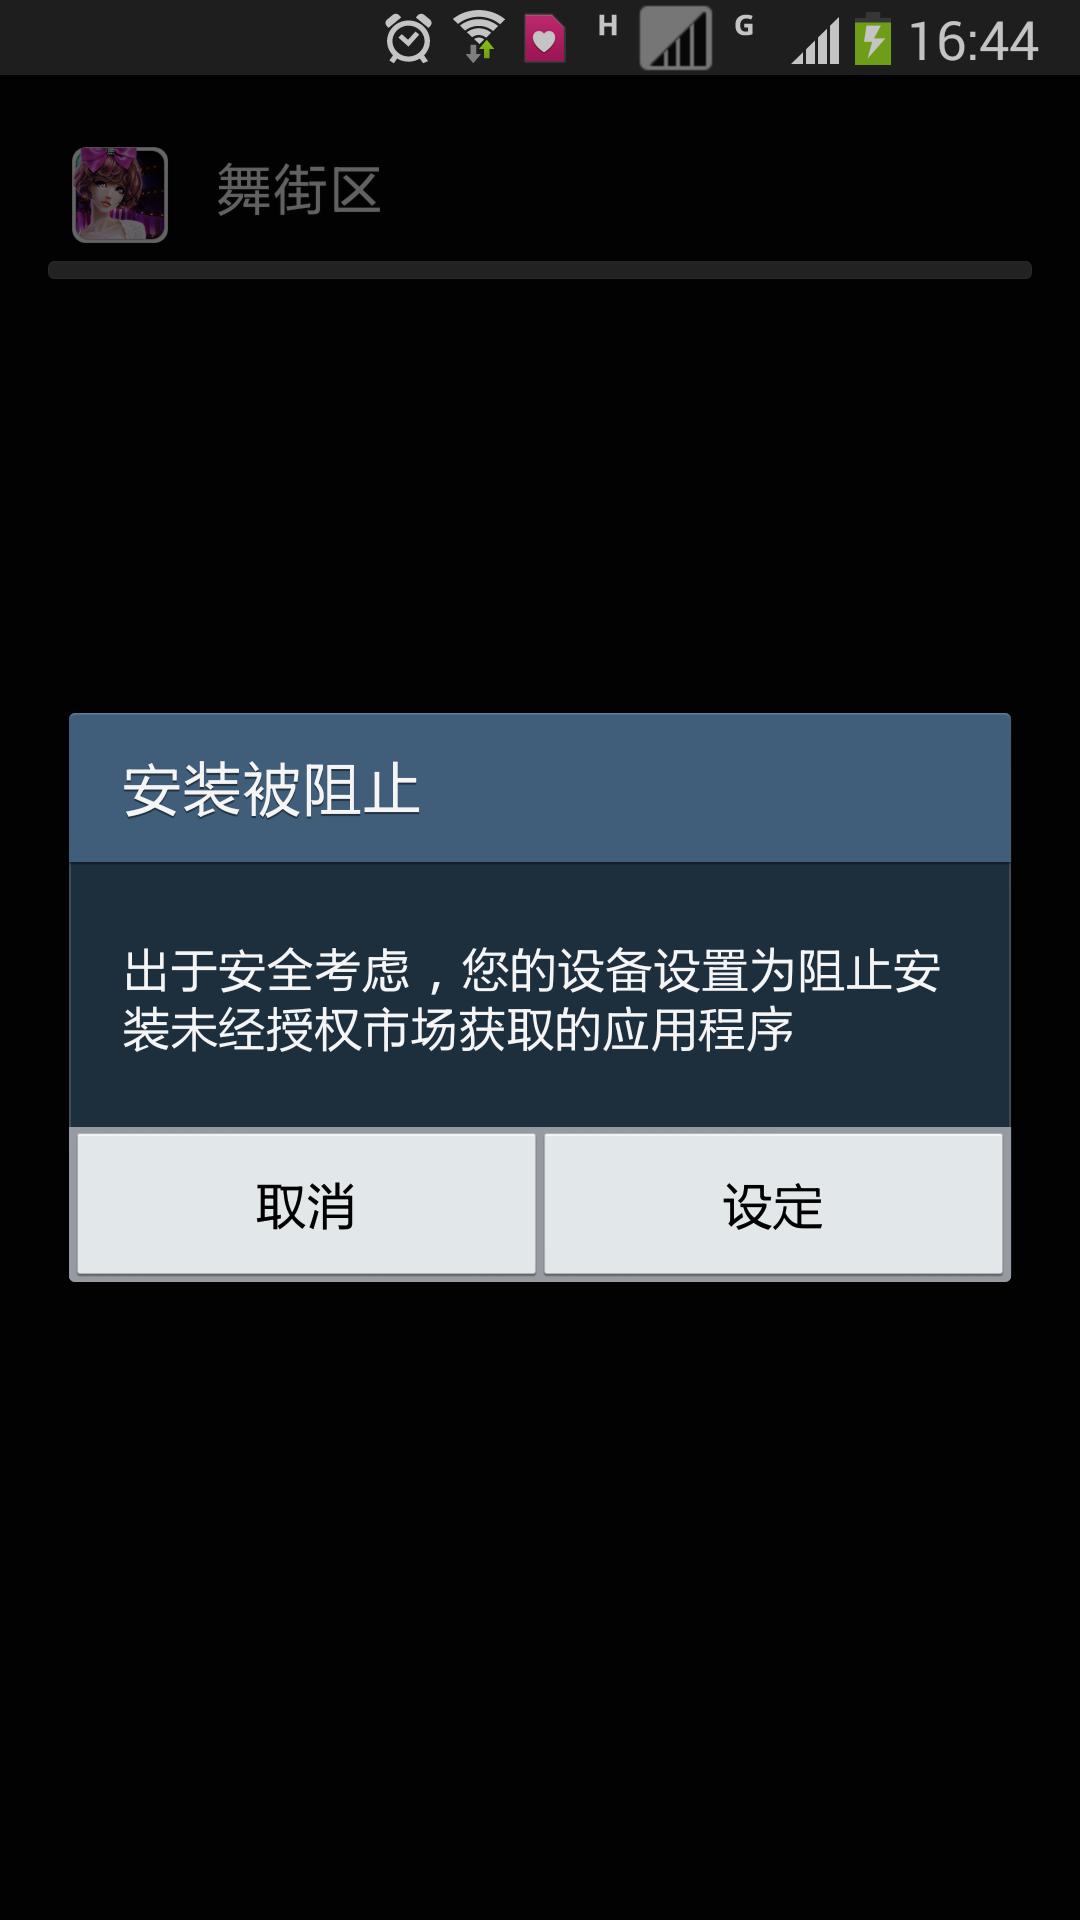 Screenshot_2015-09-23-16-44-52.png